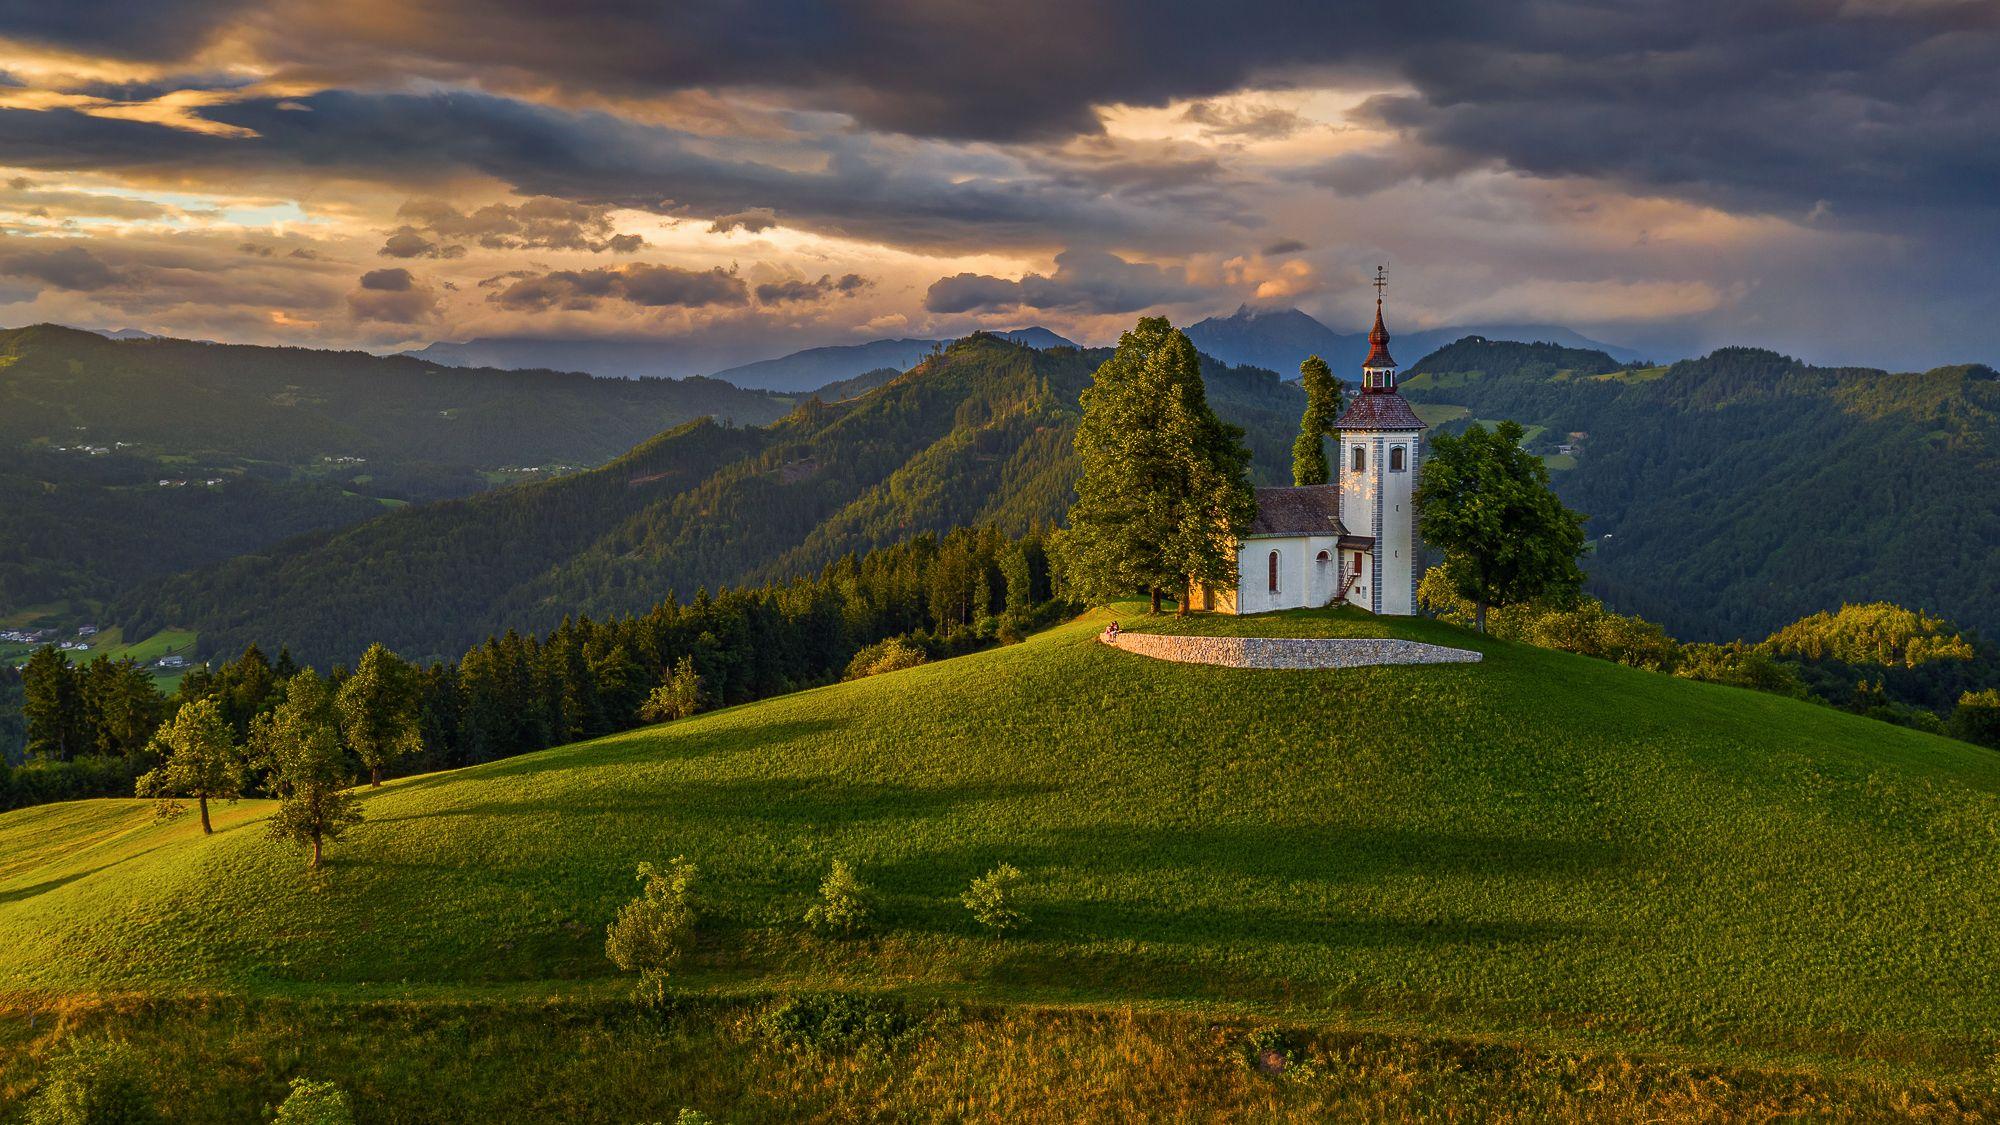 viaje fotografico eslovenia